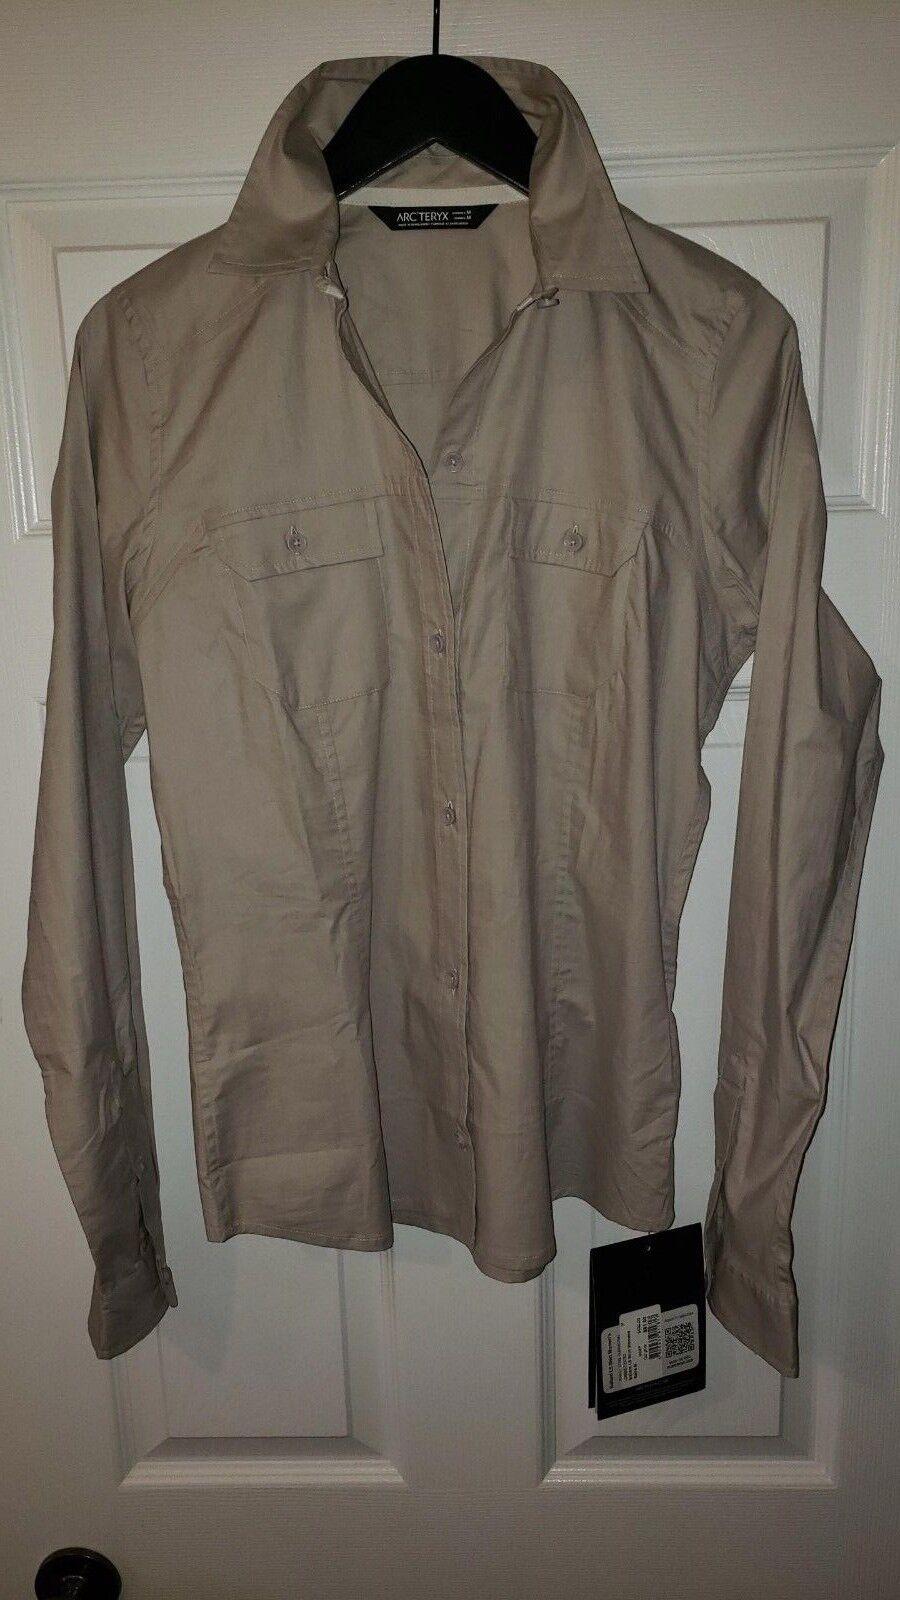 Arc`teryx Ballard long sleeve shirt size Medium in bone color brand new